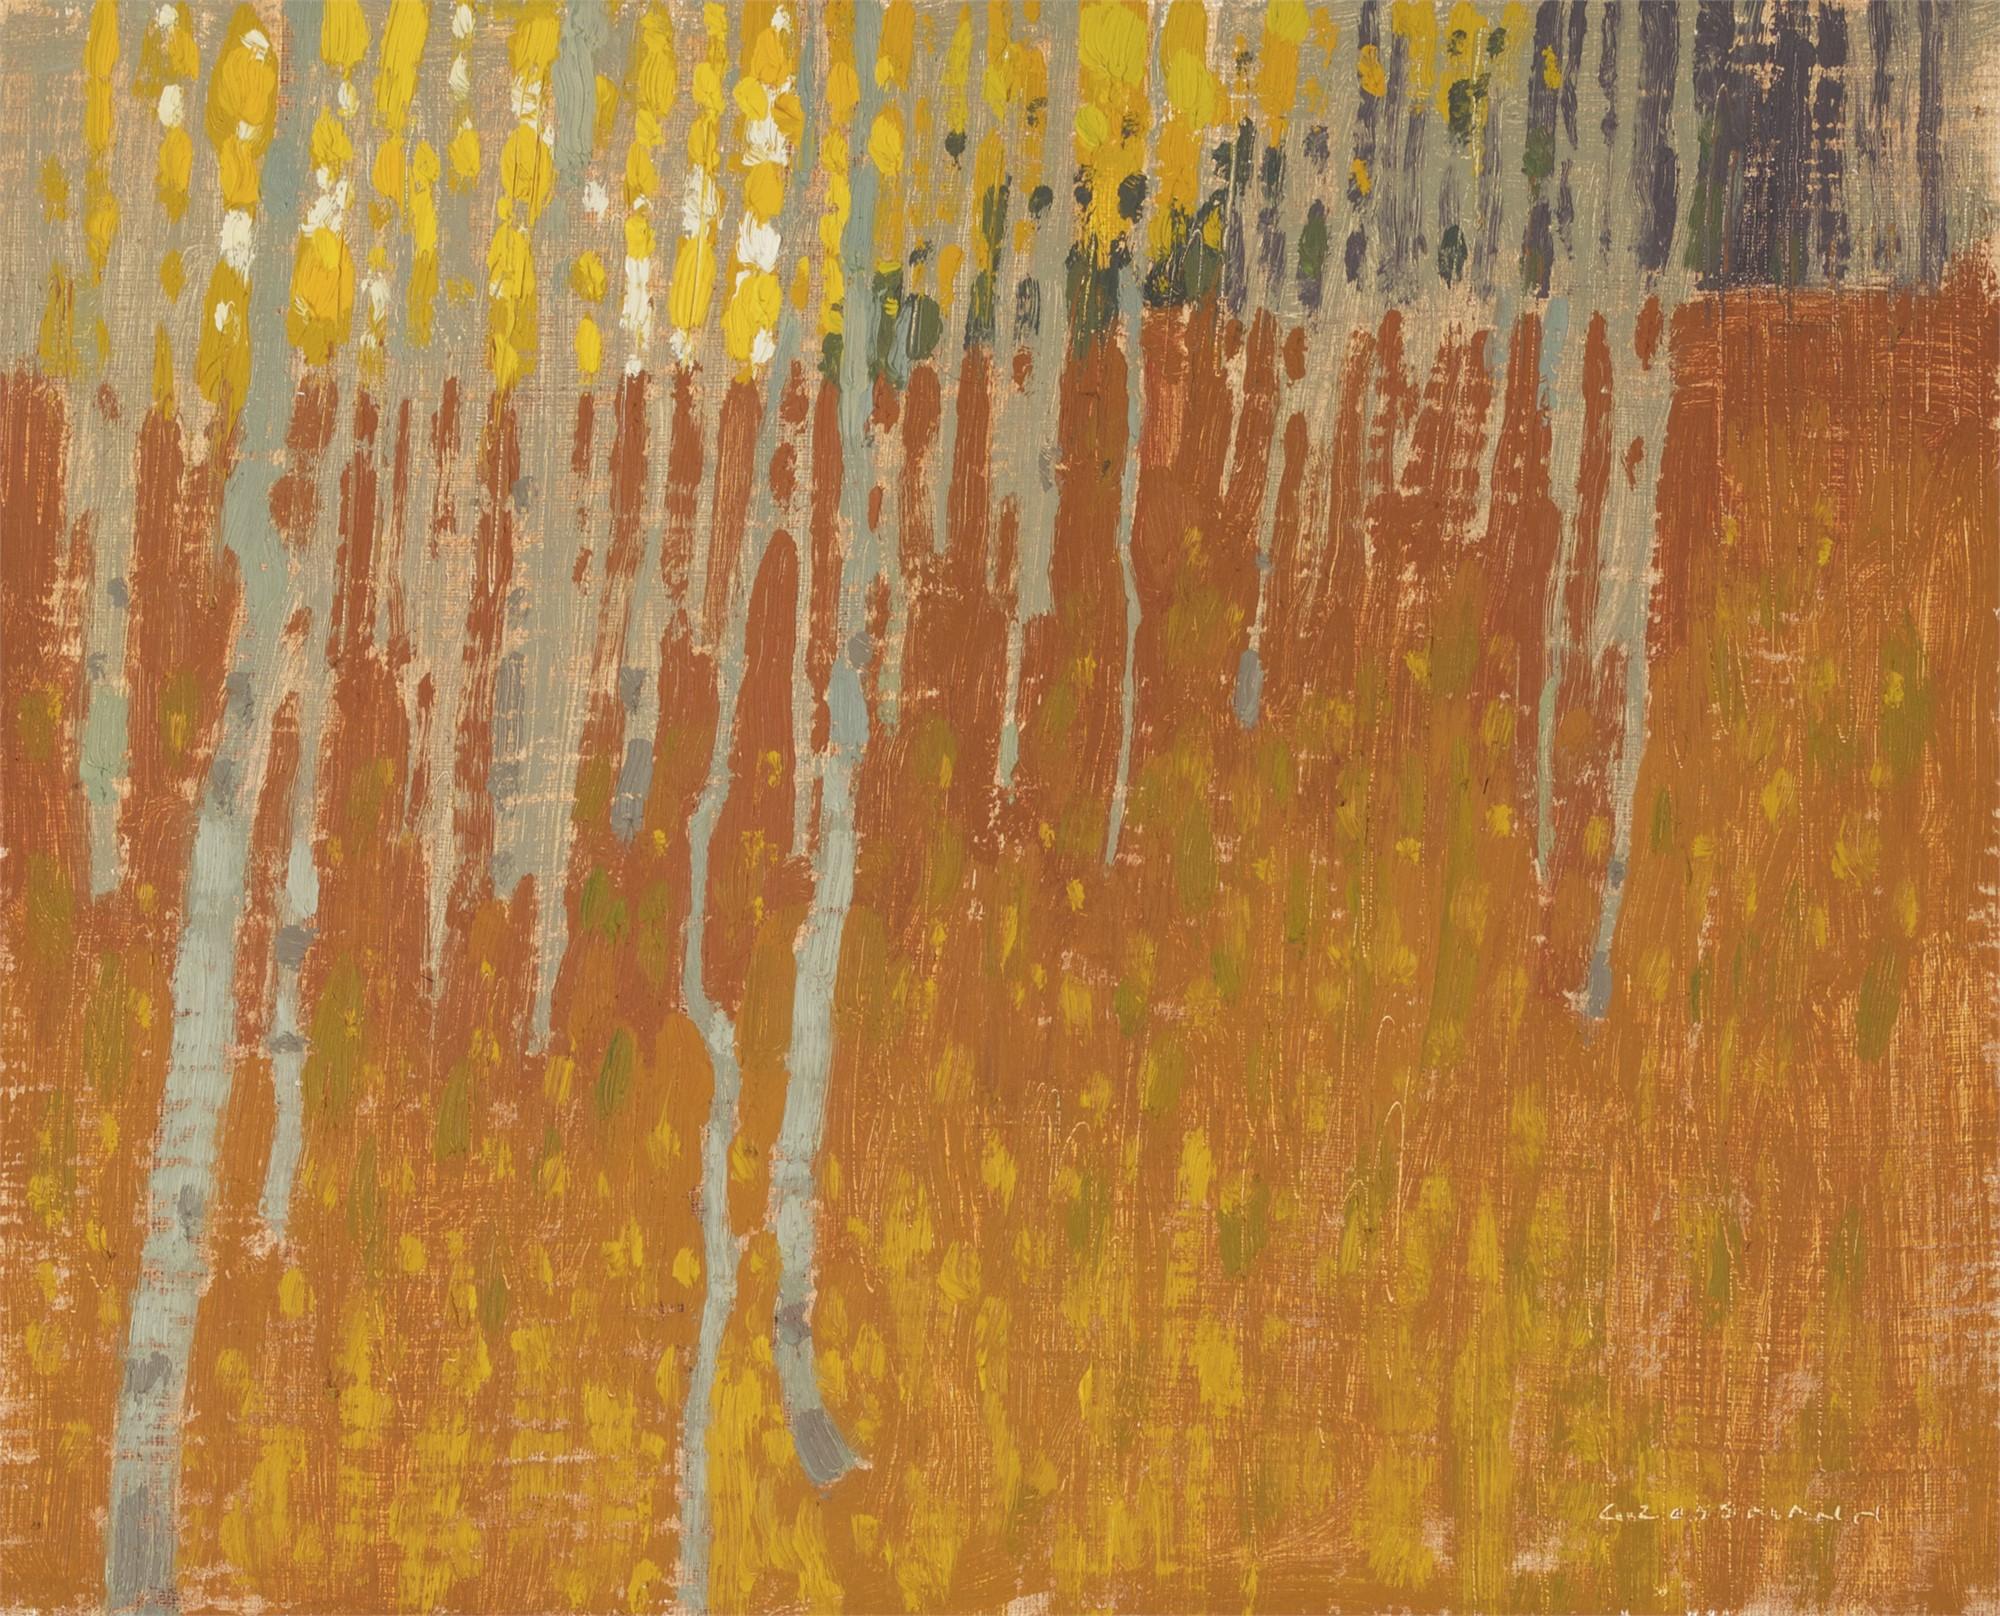 Warmth of Fallen Leaves by David Grossmann